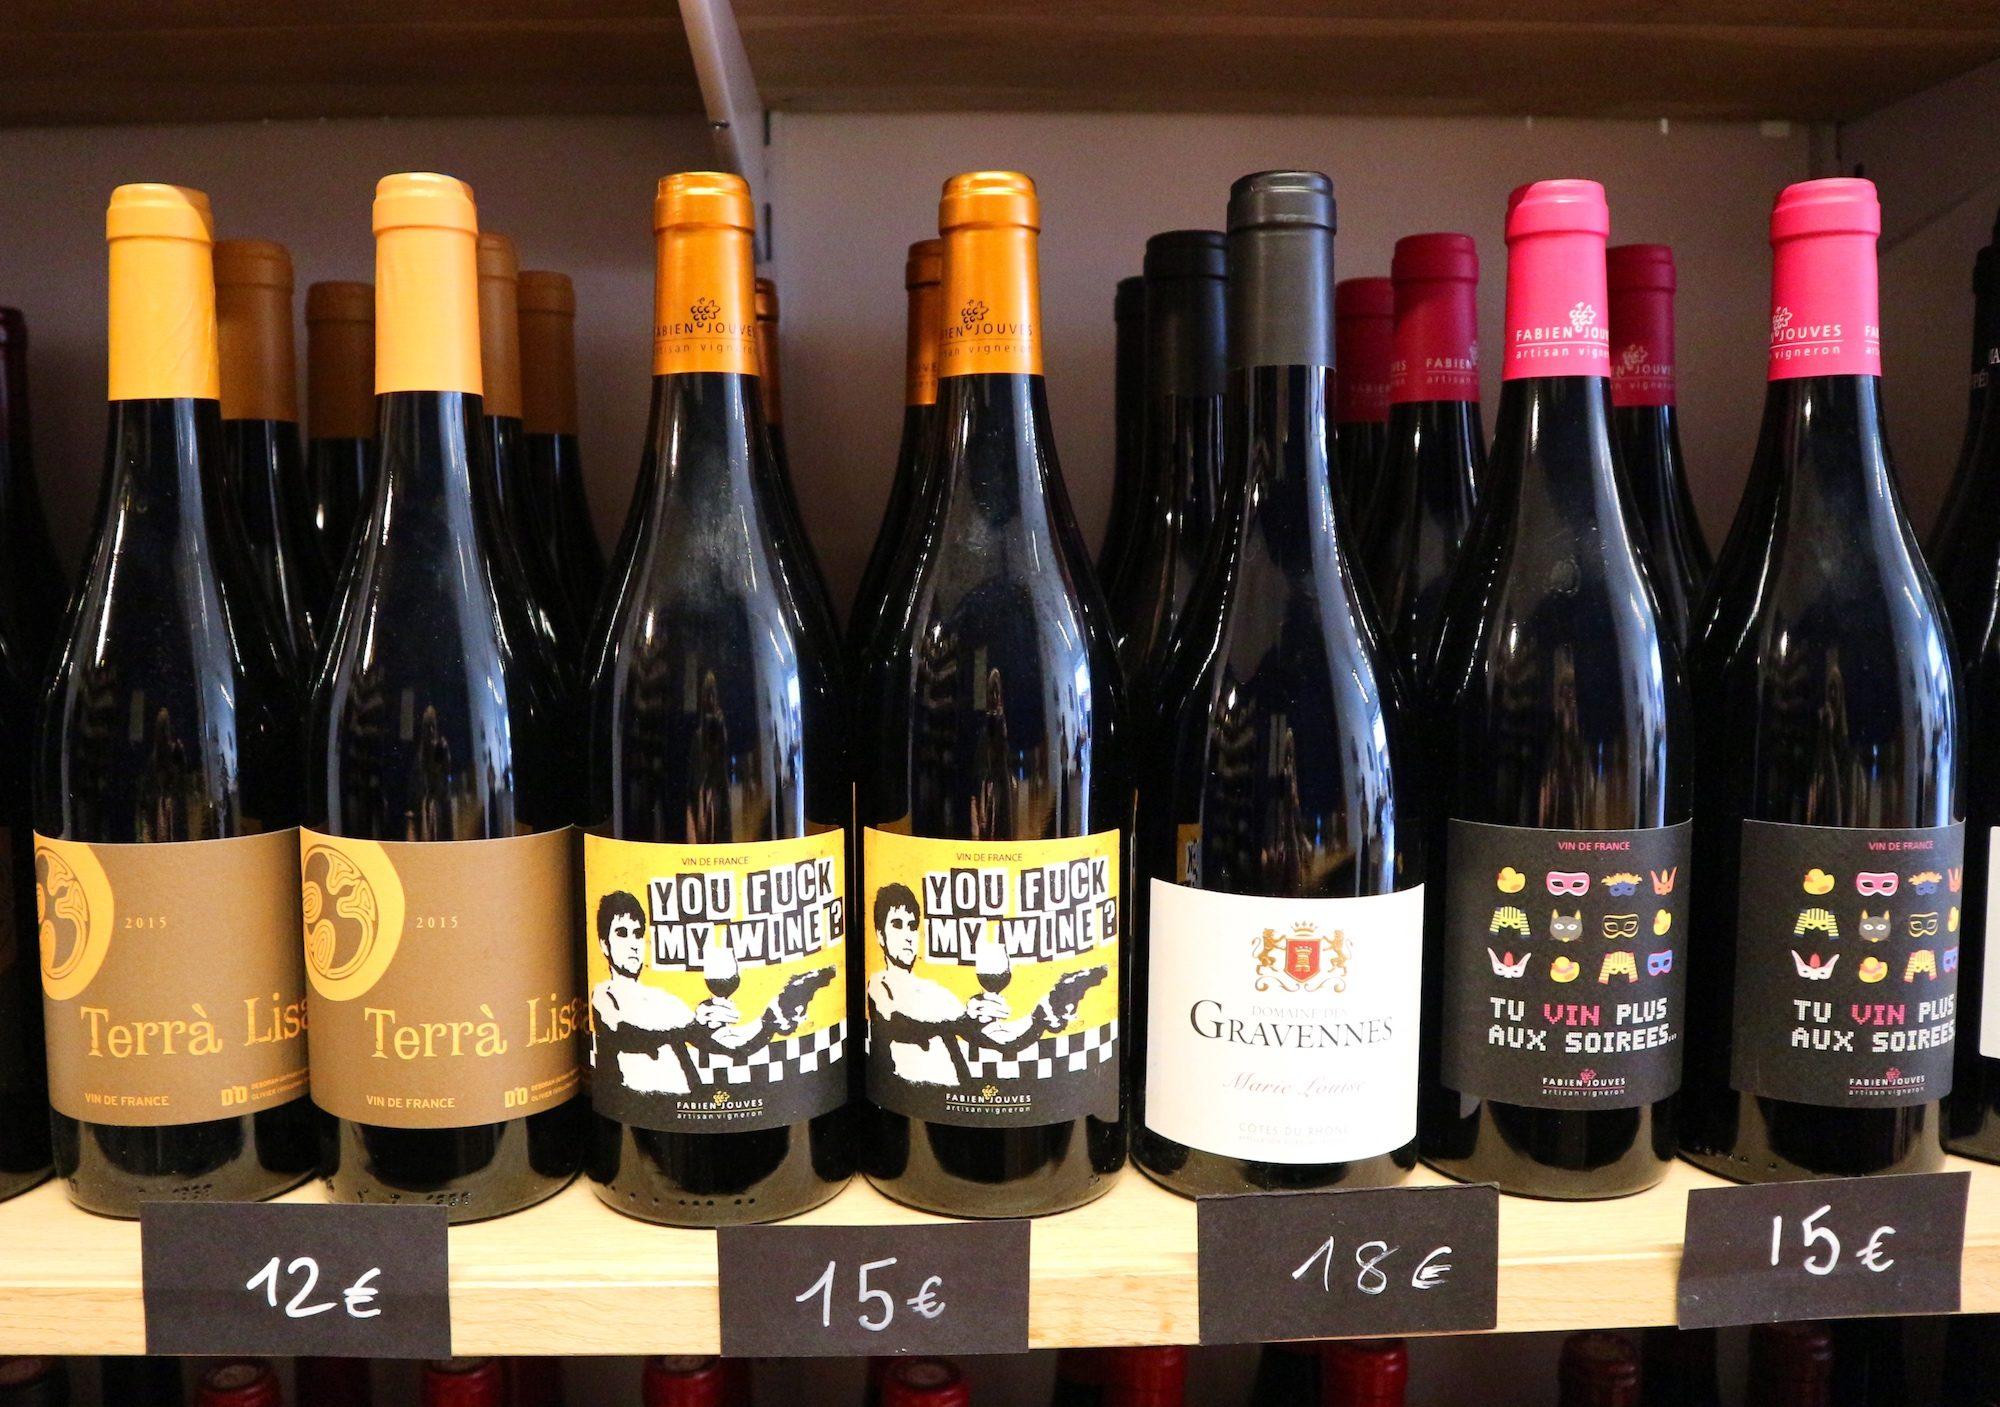 HiP Paris Blog's best places to buy wine in Paris include the Federation Francaise de l'Aperitif in the cool Batignolles neighborhood.